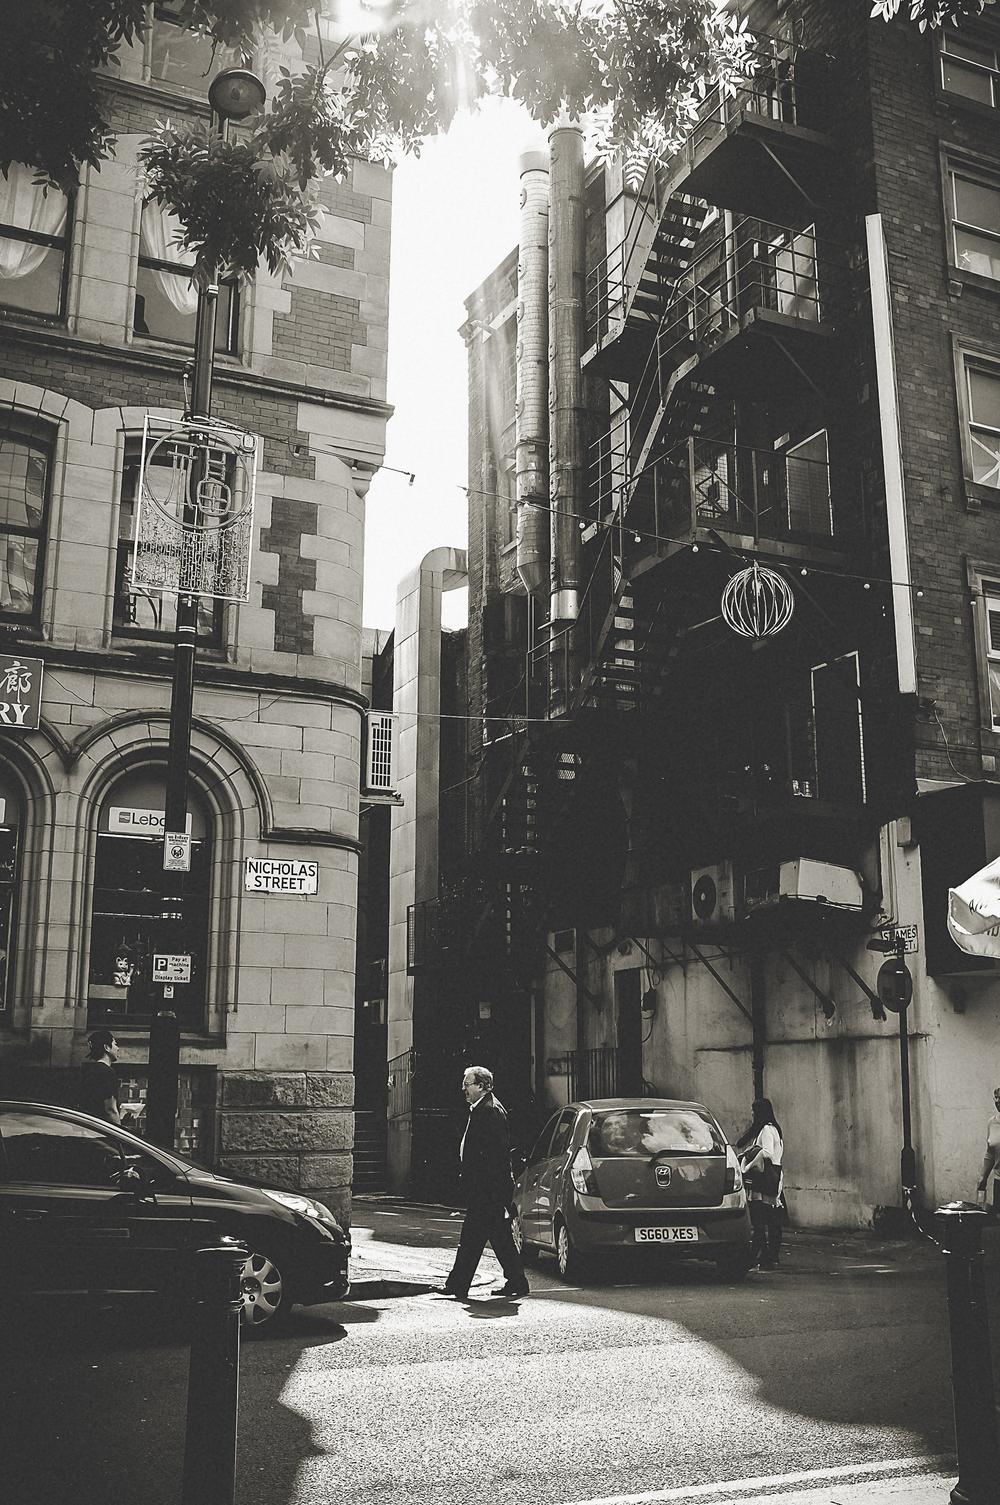 street_photography_fuji_x100-15.jpg